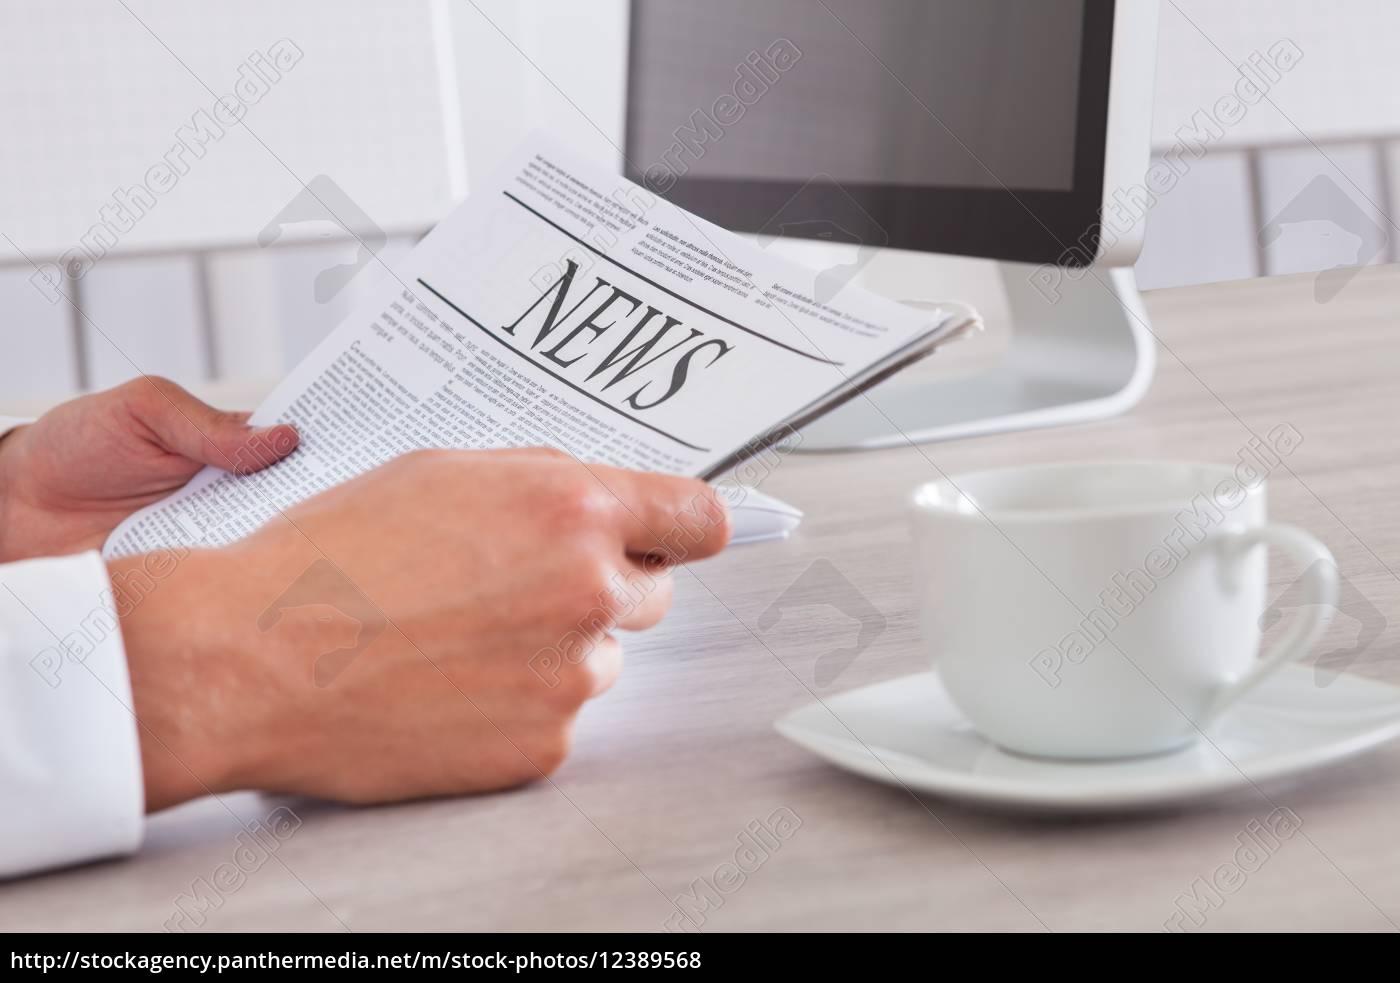 man, holding, newspaper - 12389568